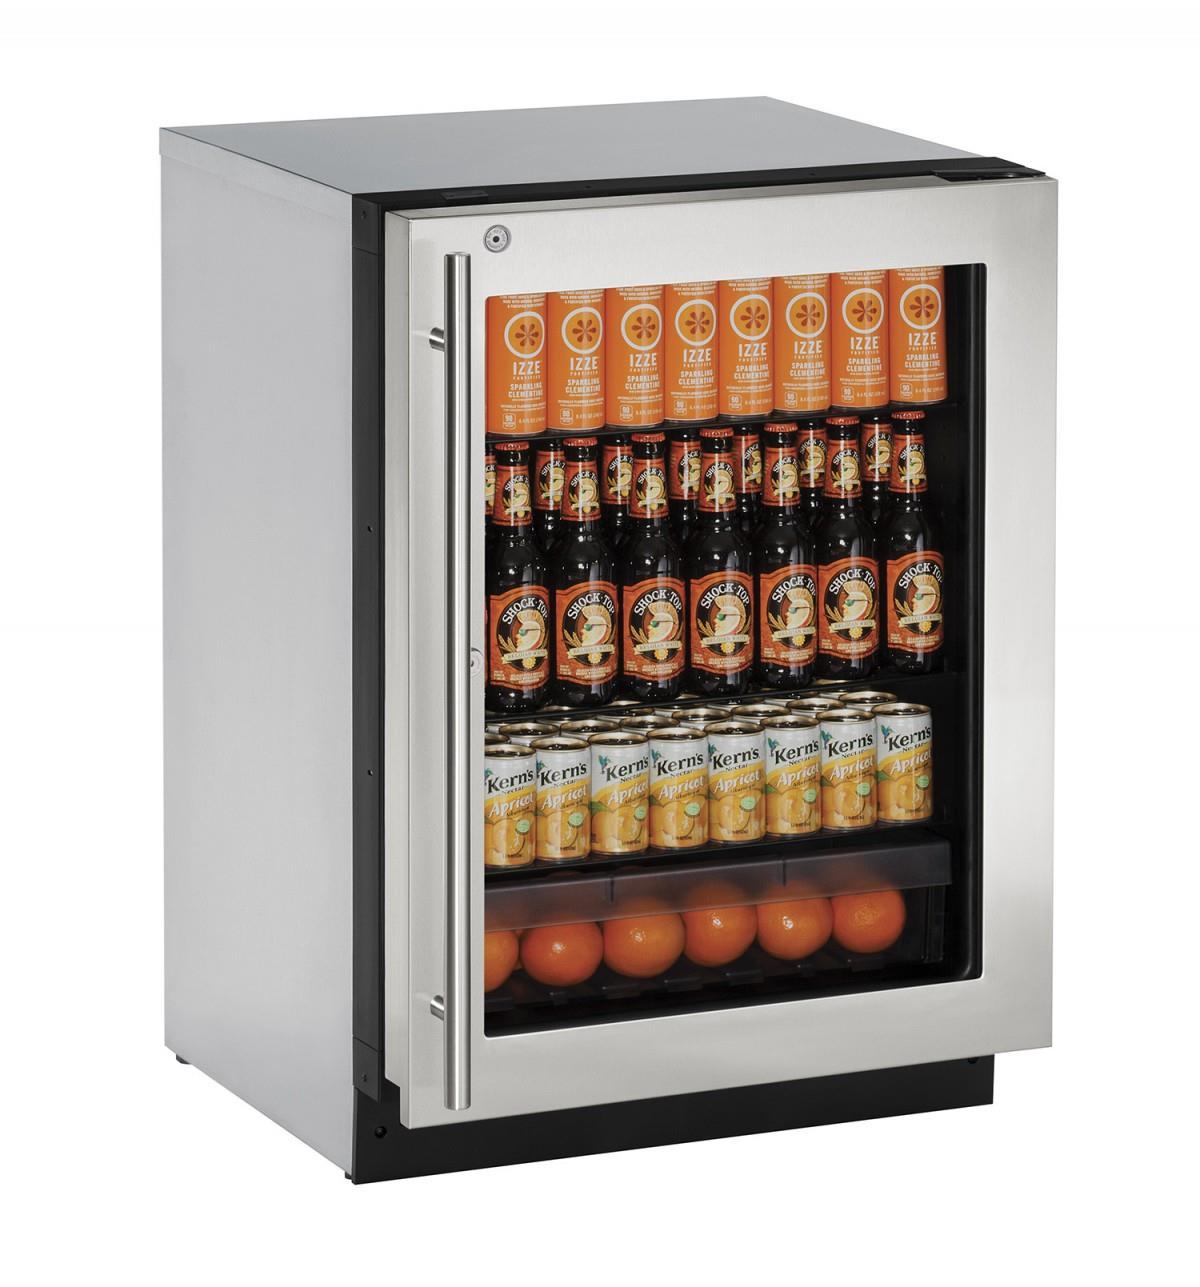 U-Line Refrigerators 4.9 cu. ft. Built-in Compact Refrigerator - Item Number: U-2224RGLS-15A